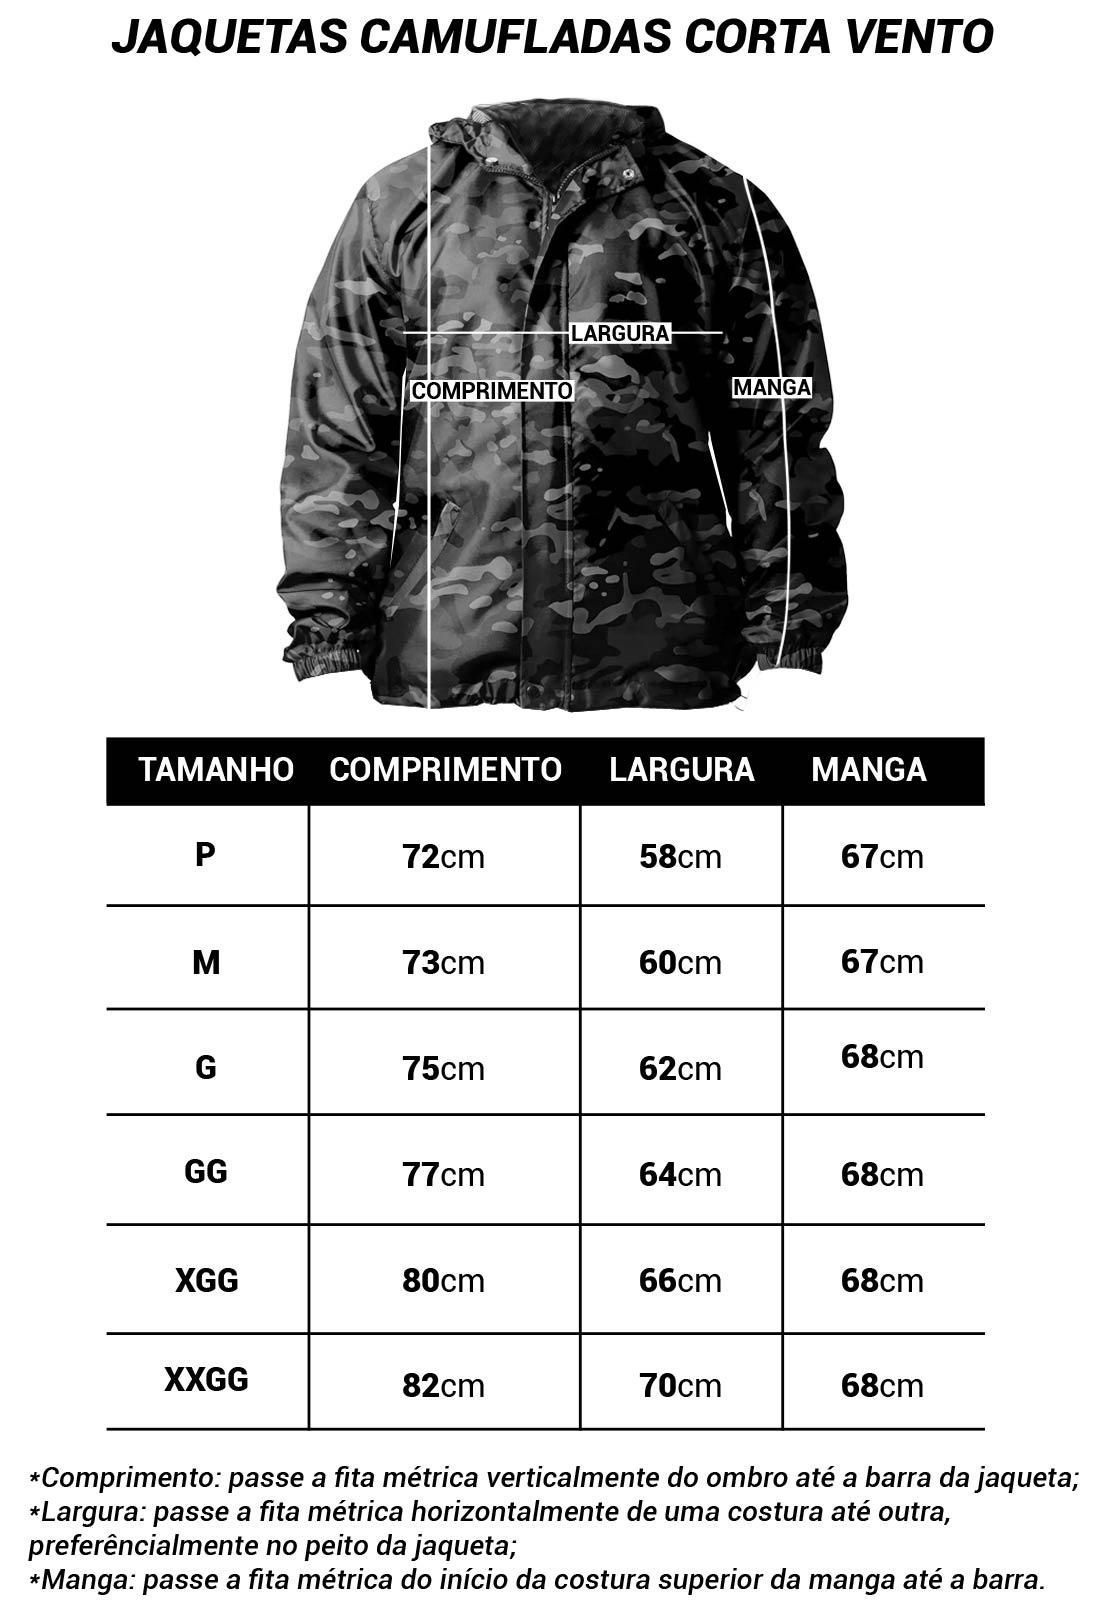 JAQUETA CORTA VENTO CAMUFLADA REALTREE  MASCULINA  - Real Hunter